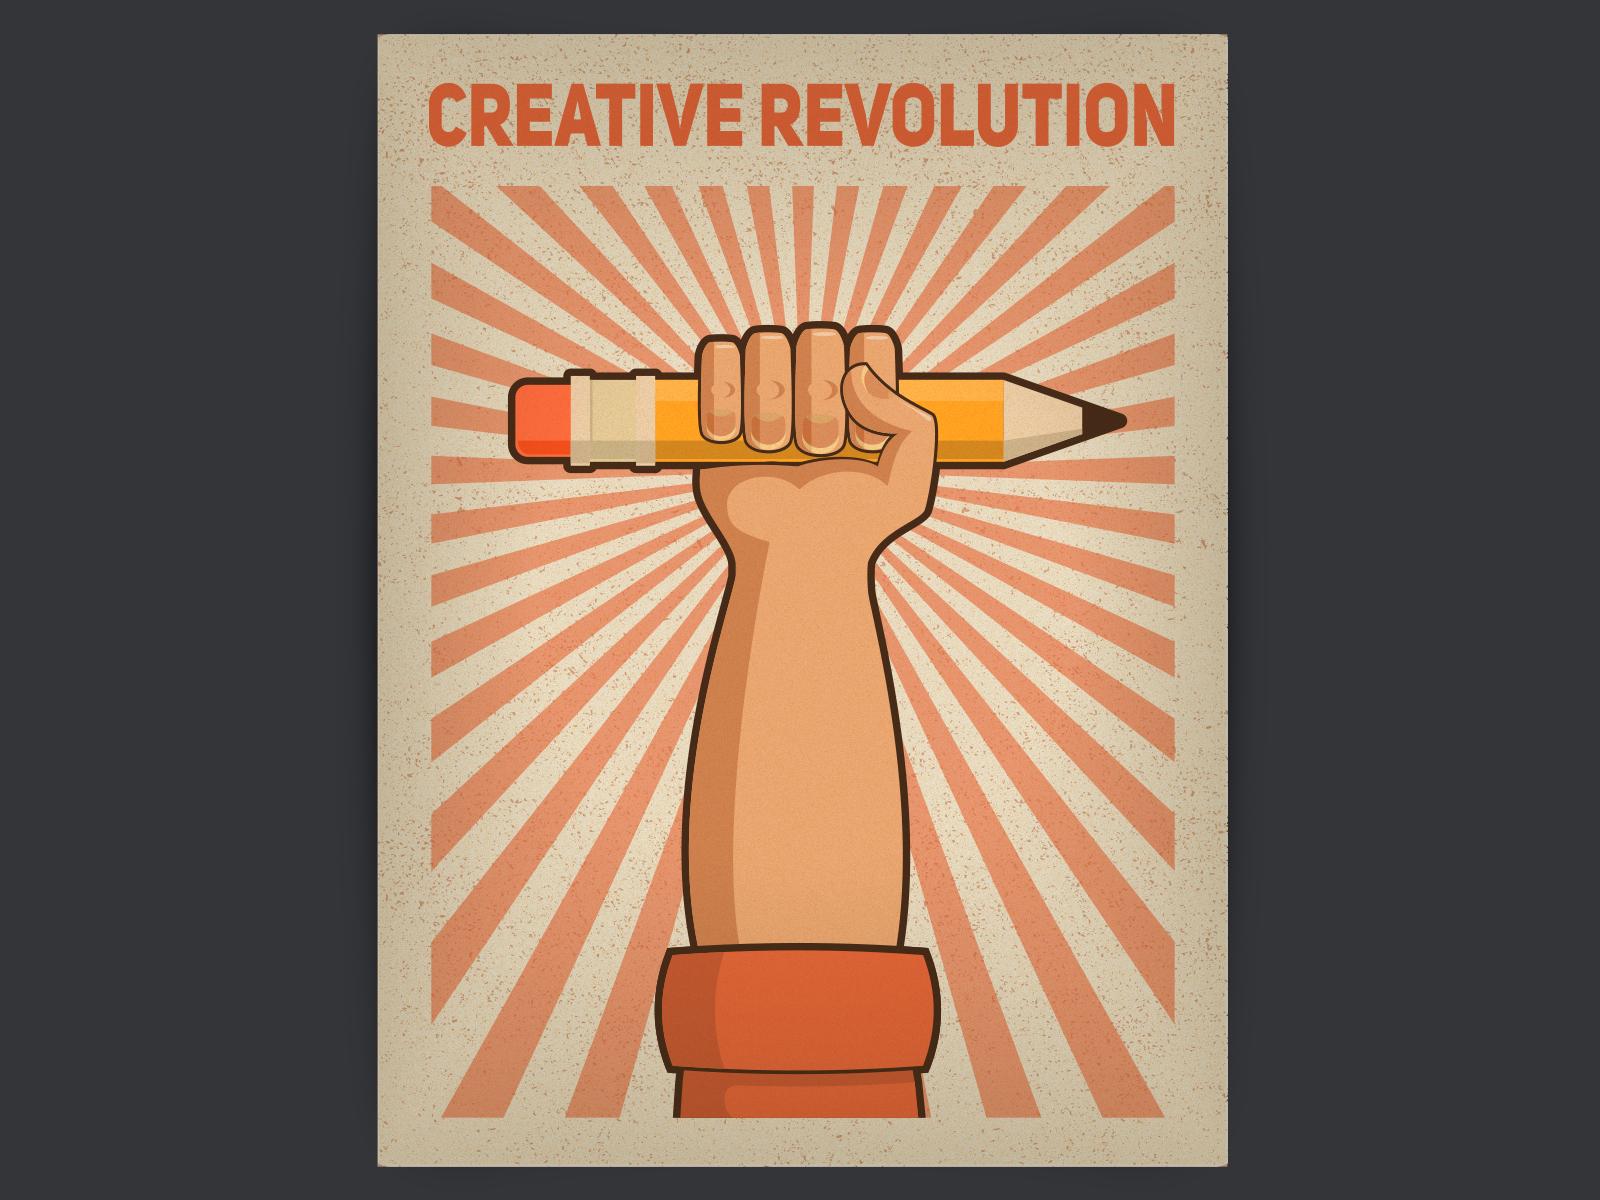 yere armenias creative revolution - HD1600×1200